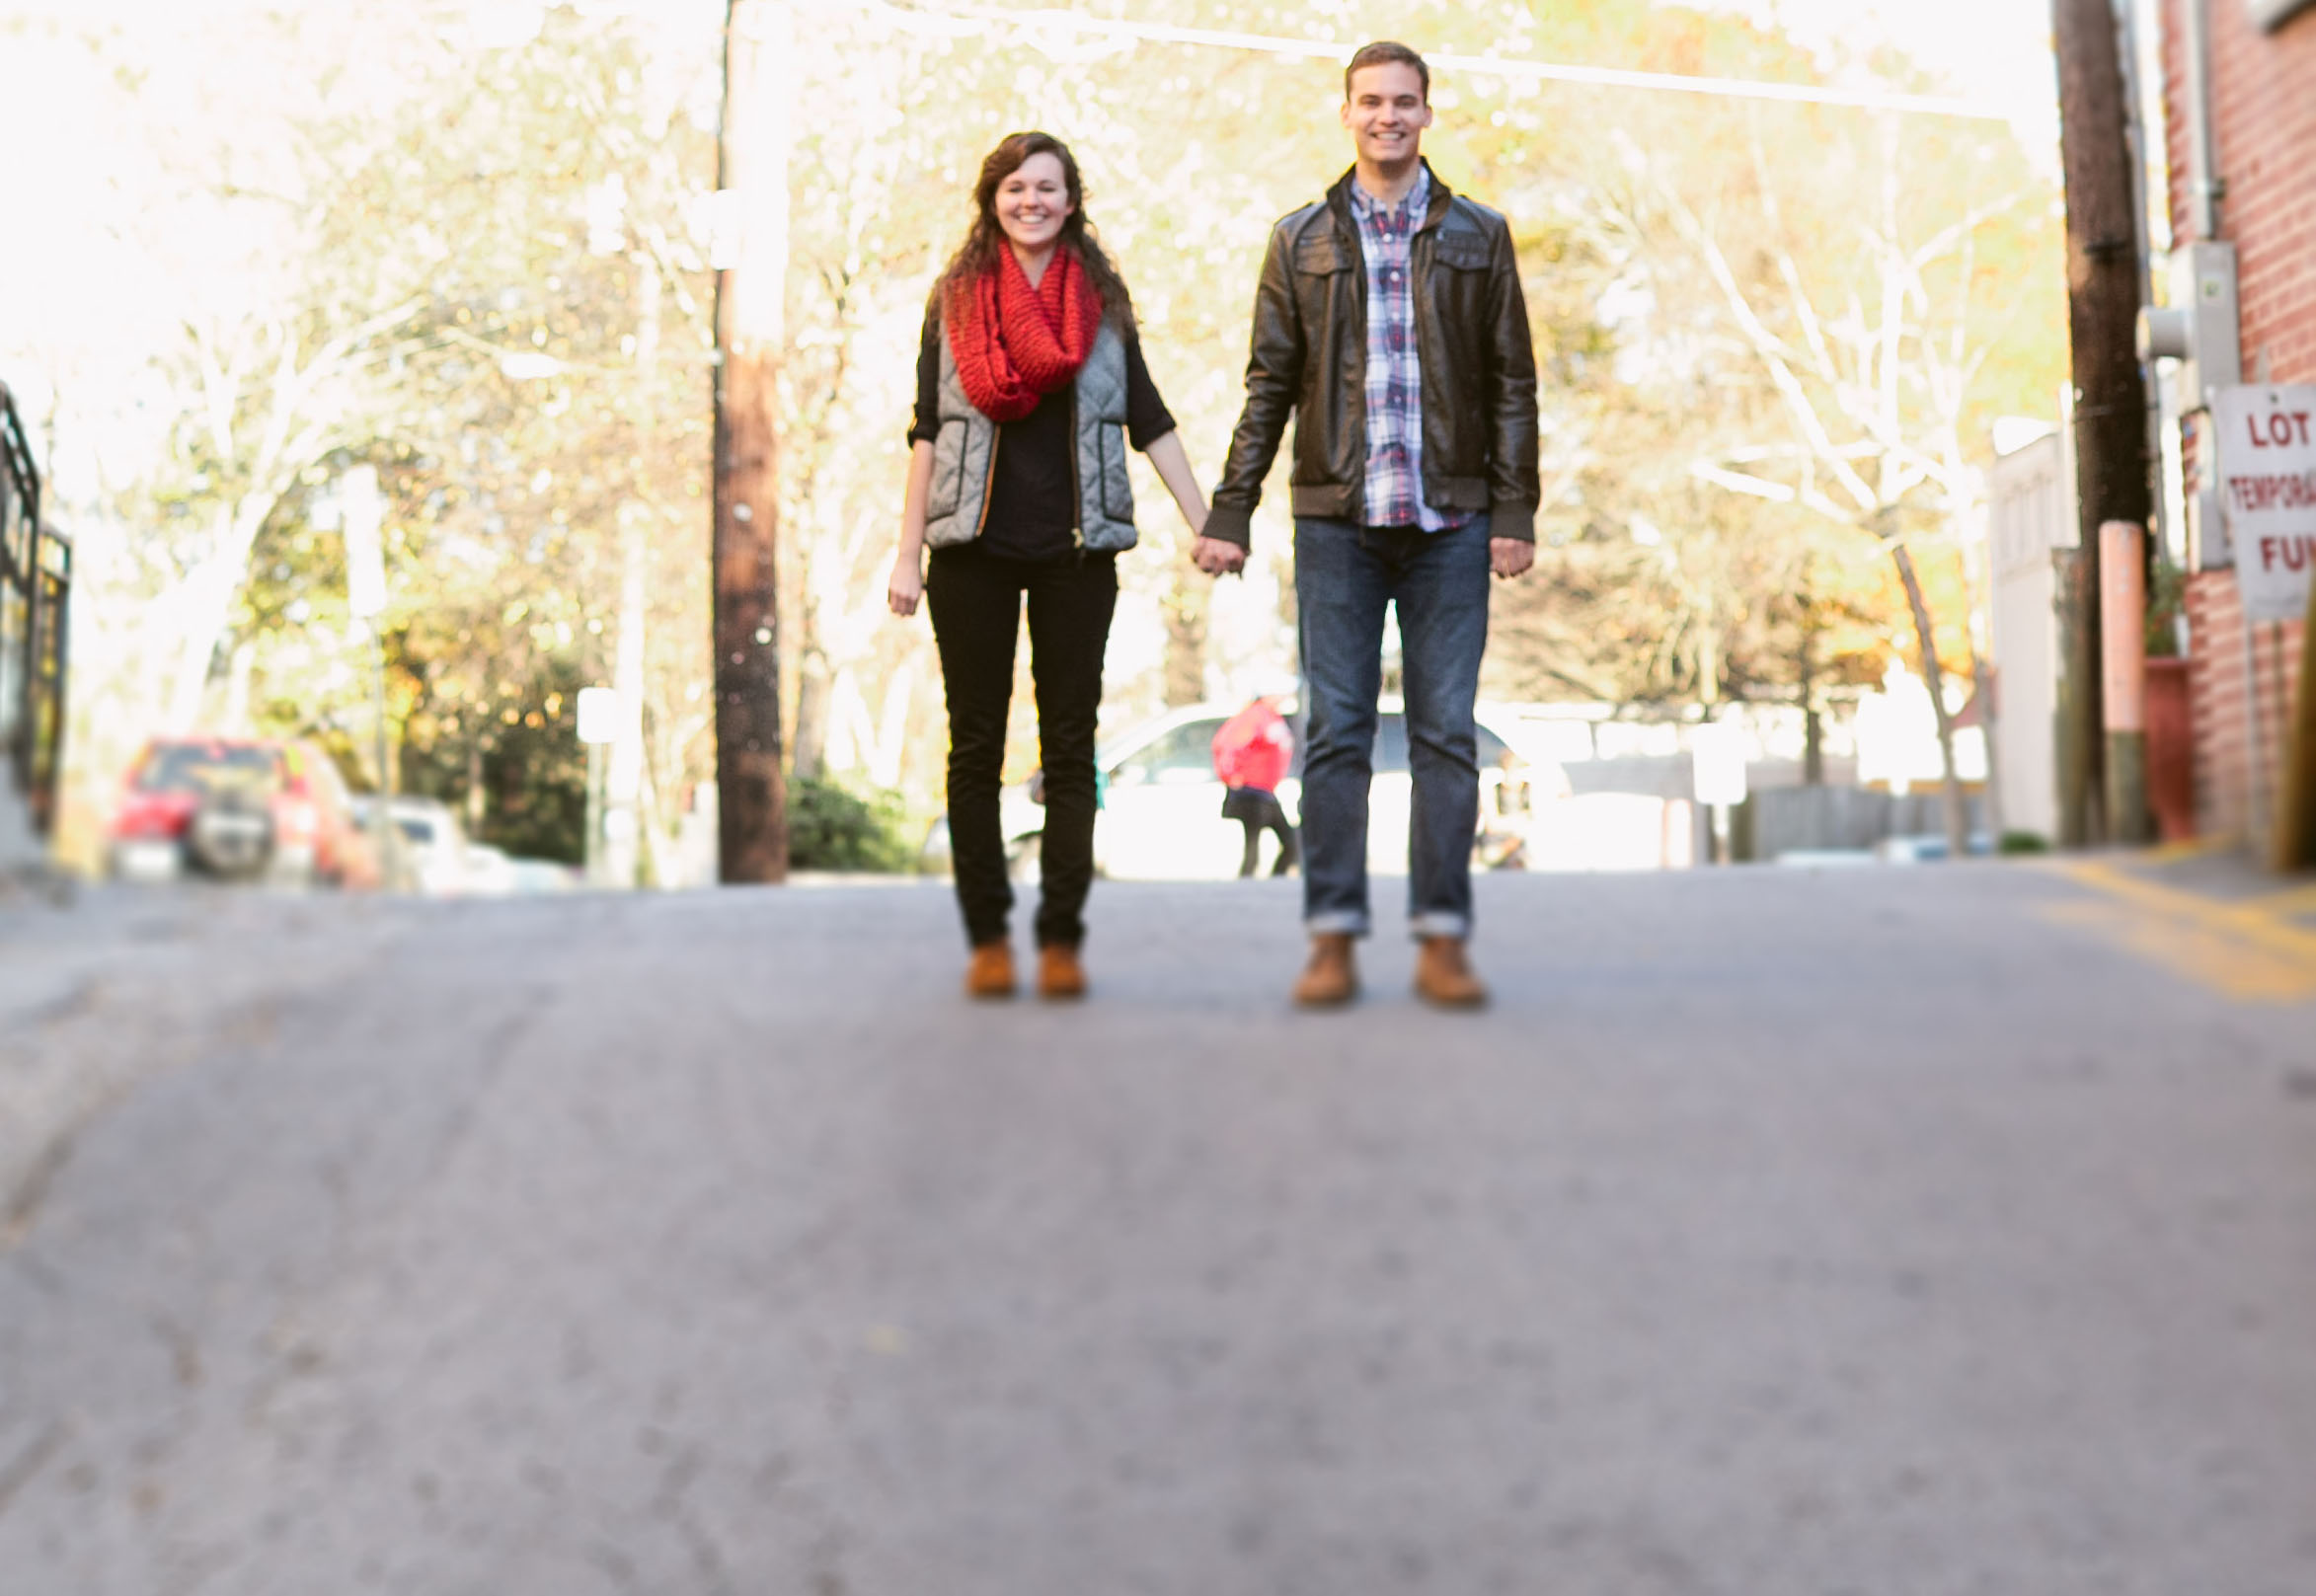 Atlanta-Engagement-Photographer-Kathryn-McCrary-Photography-Piedmont-Park-Virginia-Highlands-Fall-Engagement-Shoot-9.jpg